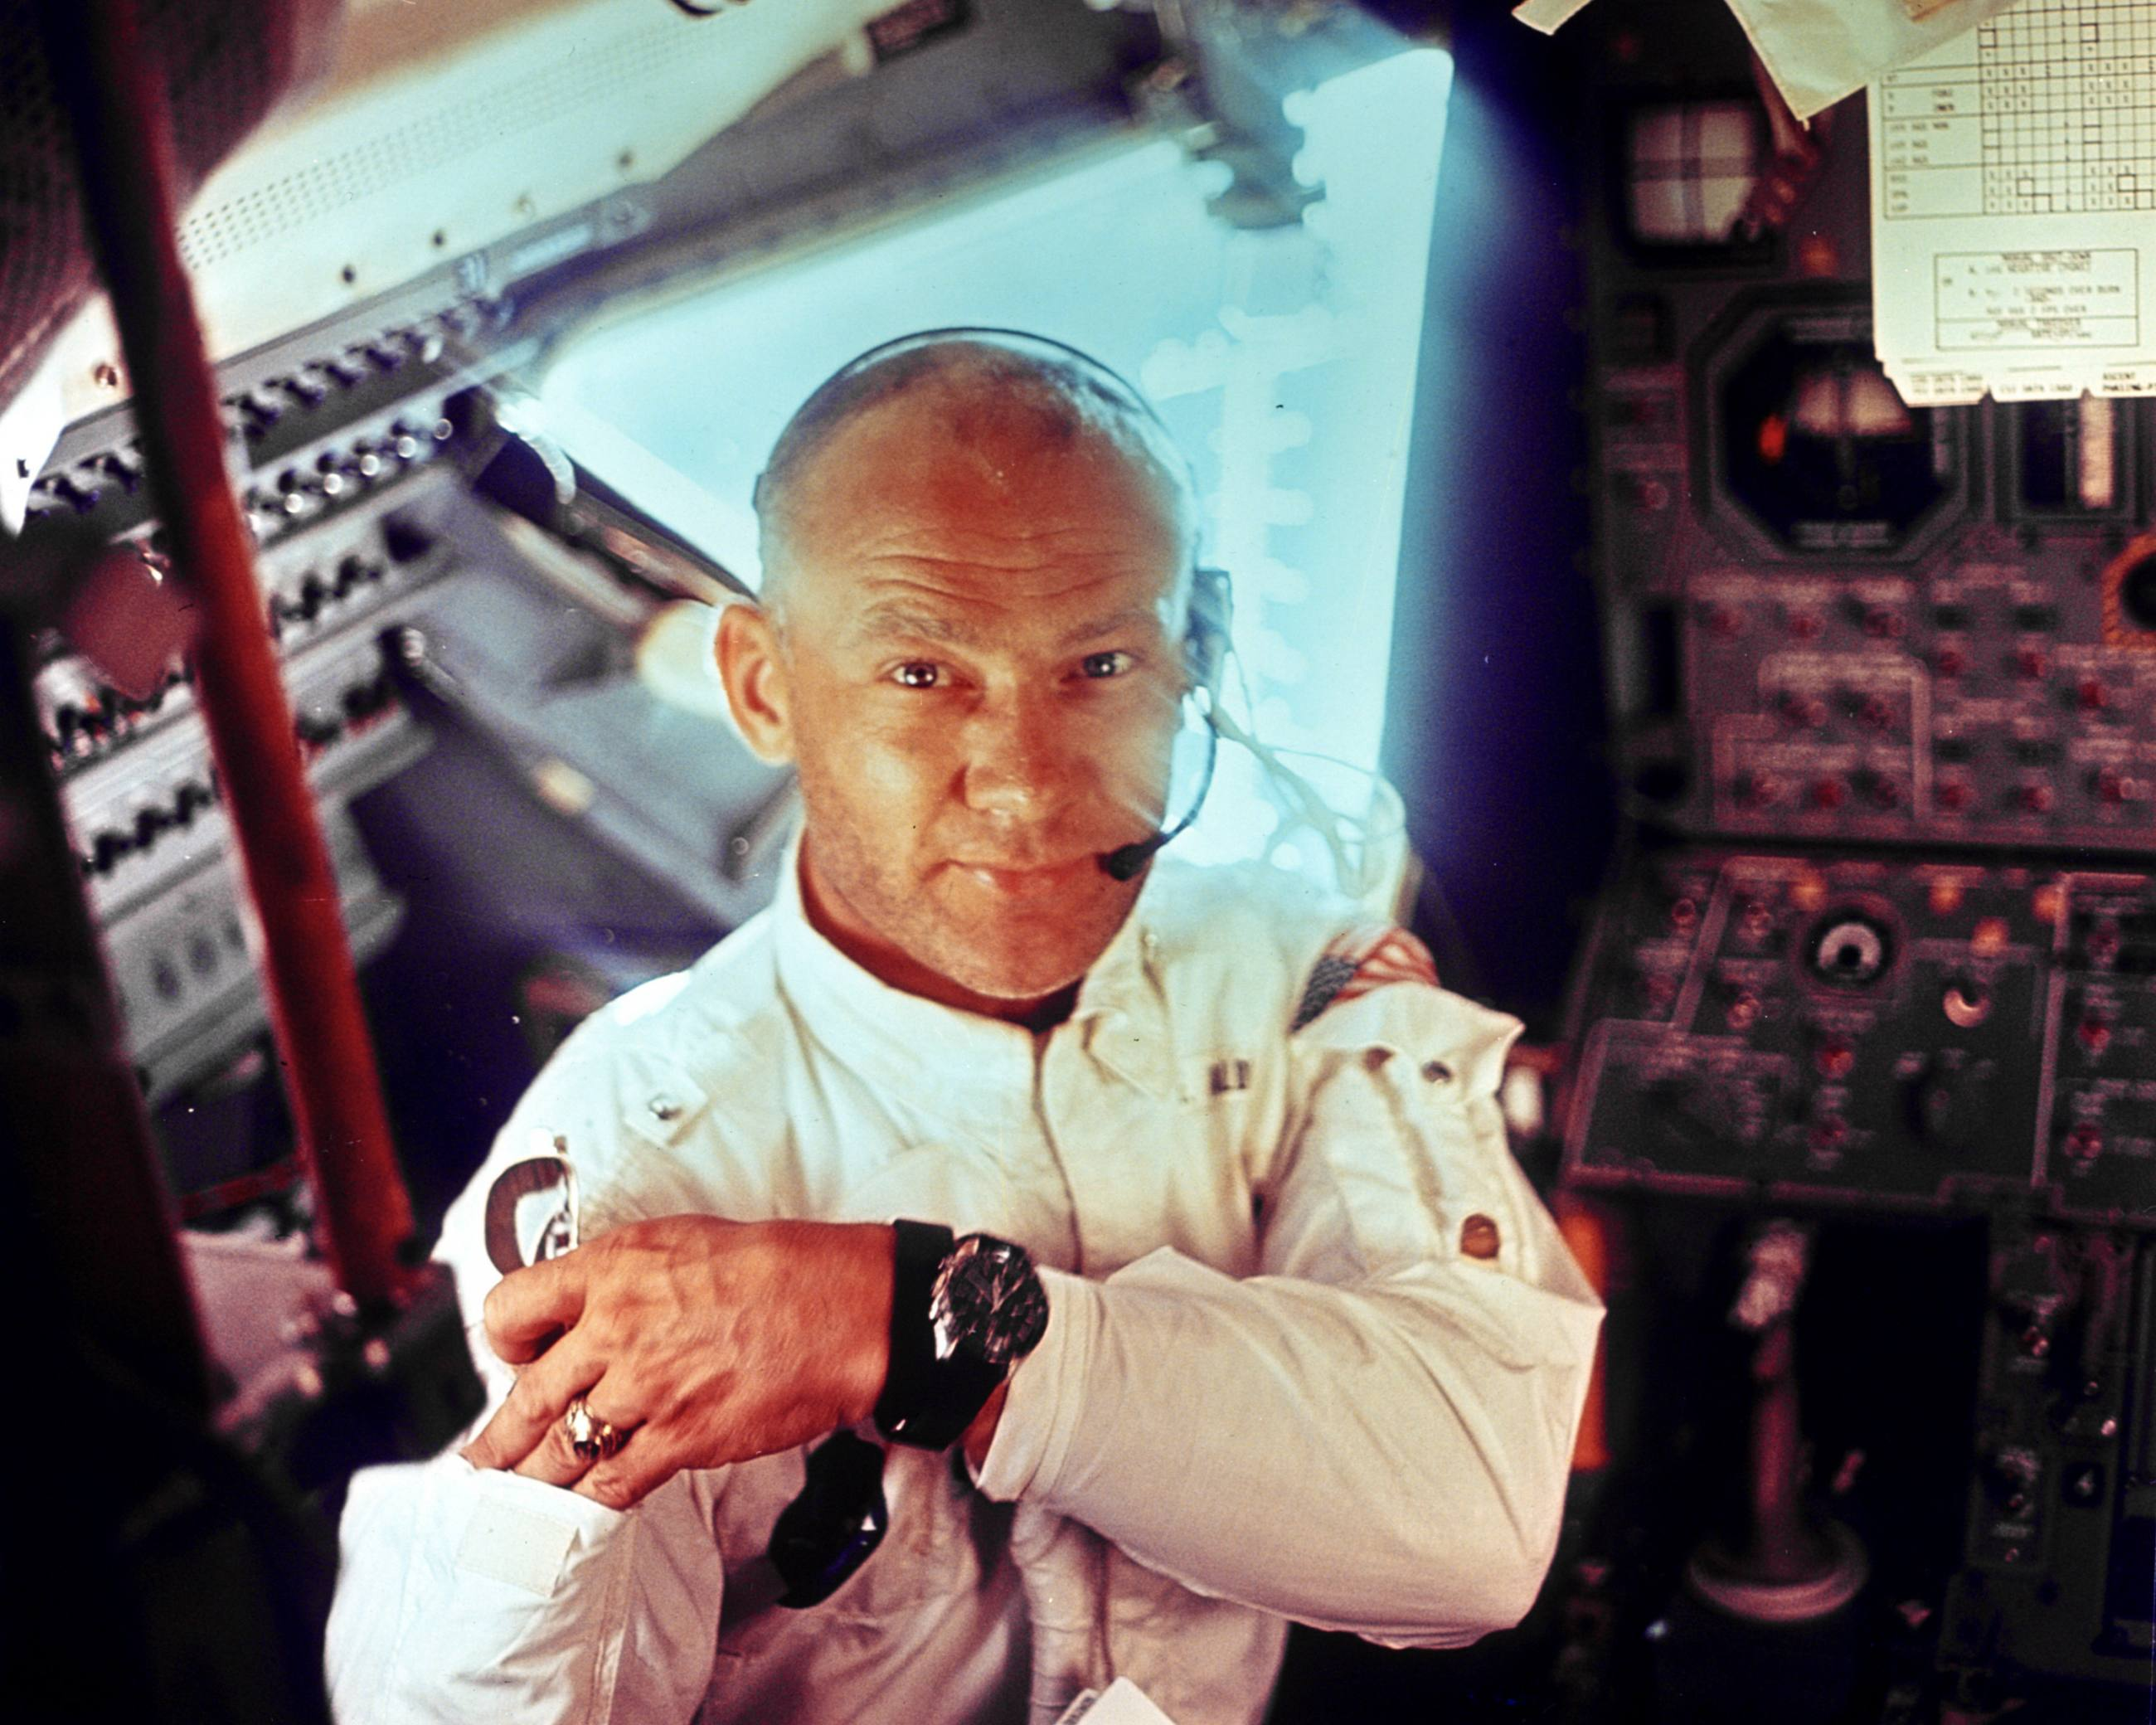 Buzz Aldrin in the Apollo 11 Lunar Module on July 20, 1969